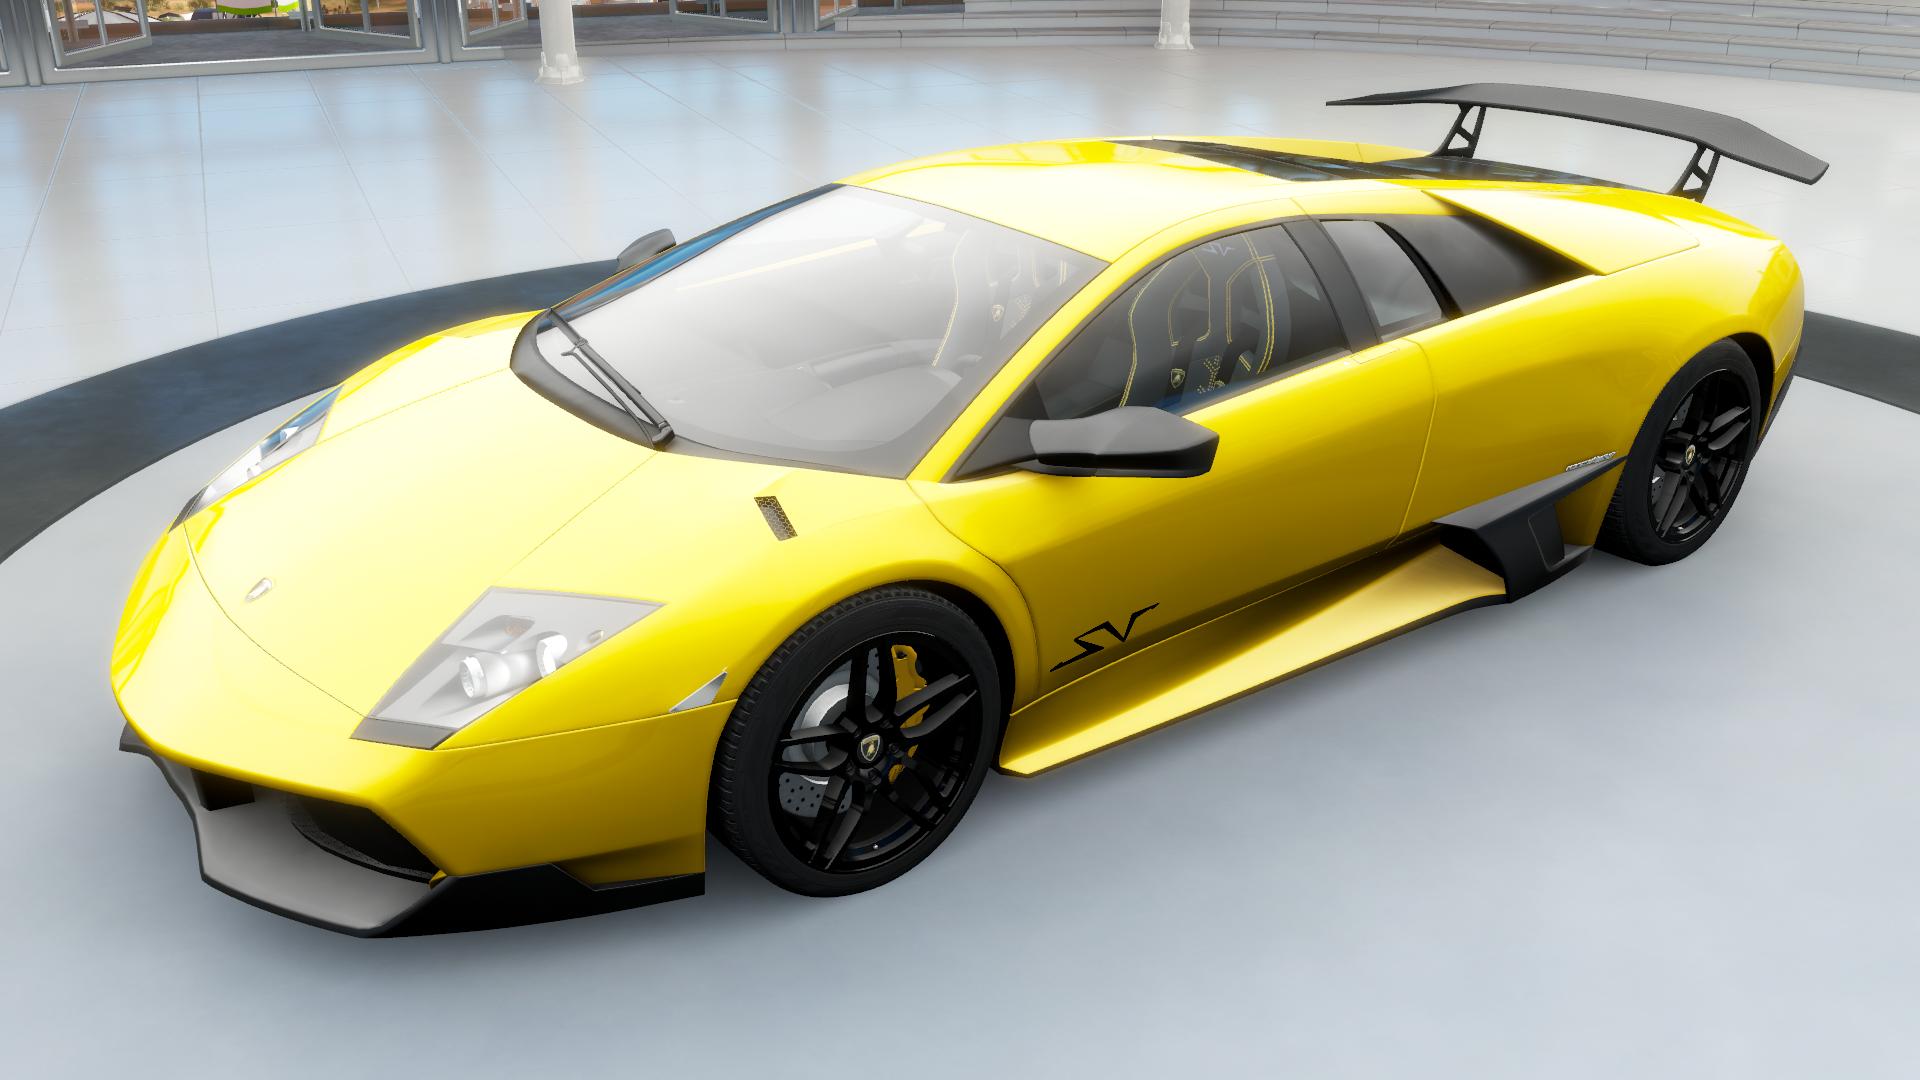 Lamborghini Murcielago LP Pics, Vehicles Collection